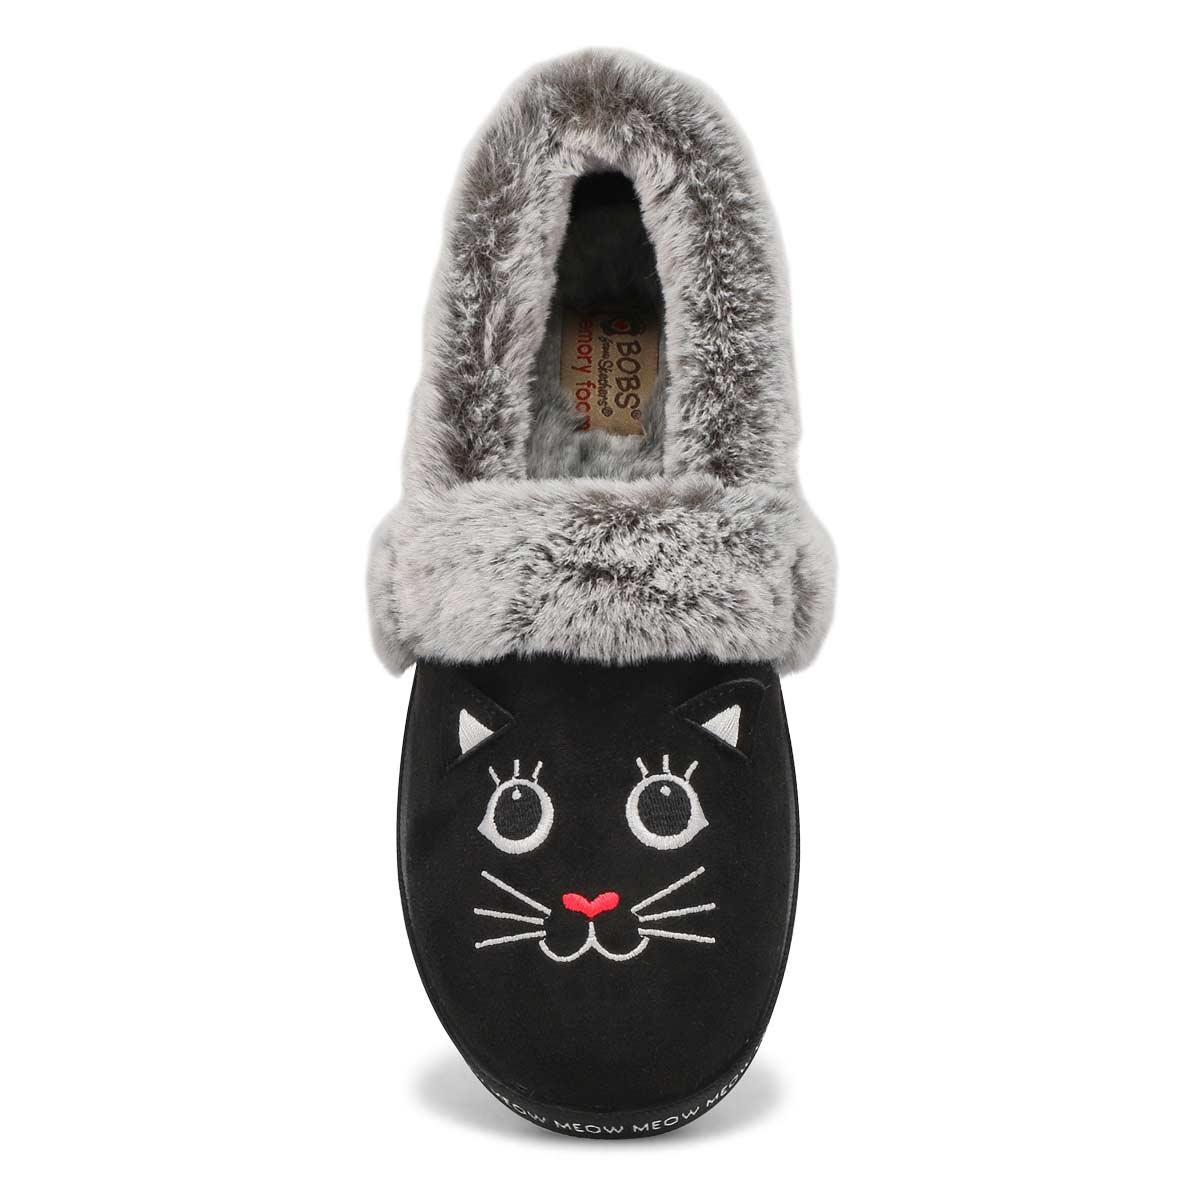 Women's Bobs Too Cozy Meow Pajamas Slipper- Black